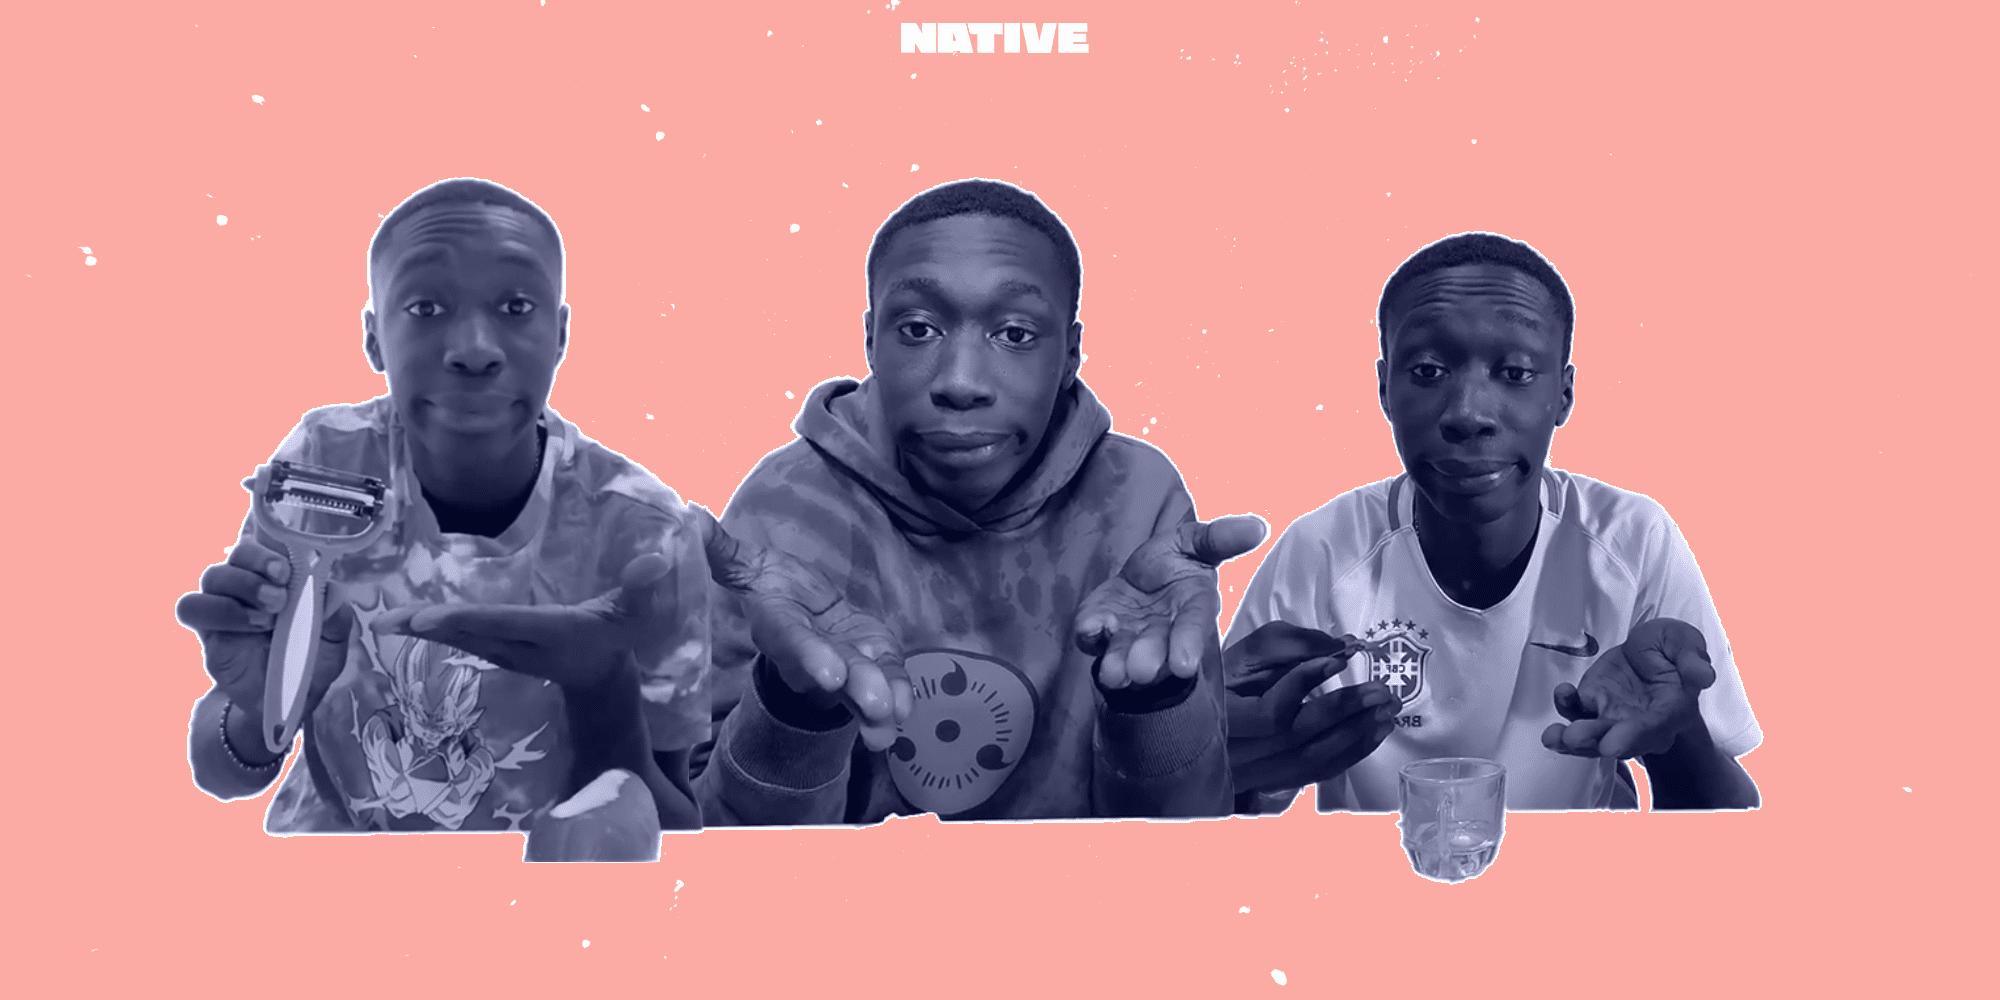 Meet Khaby Lame, the Senegalese comedy star taking over TikTok